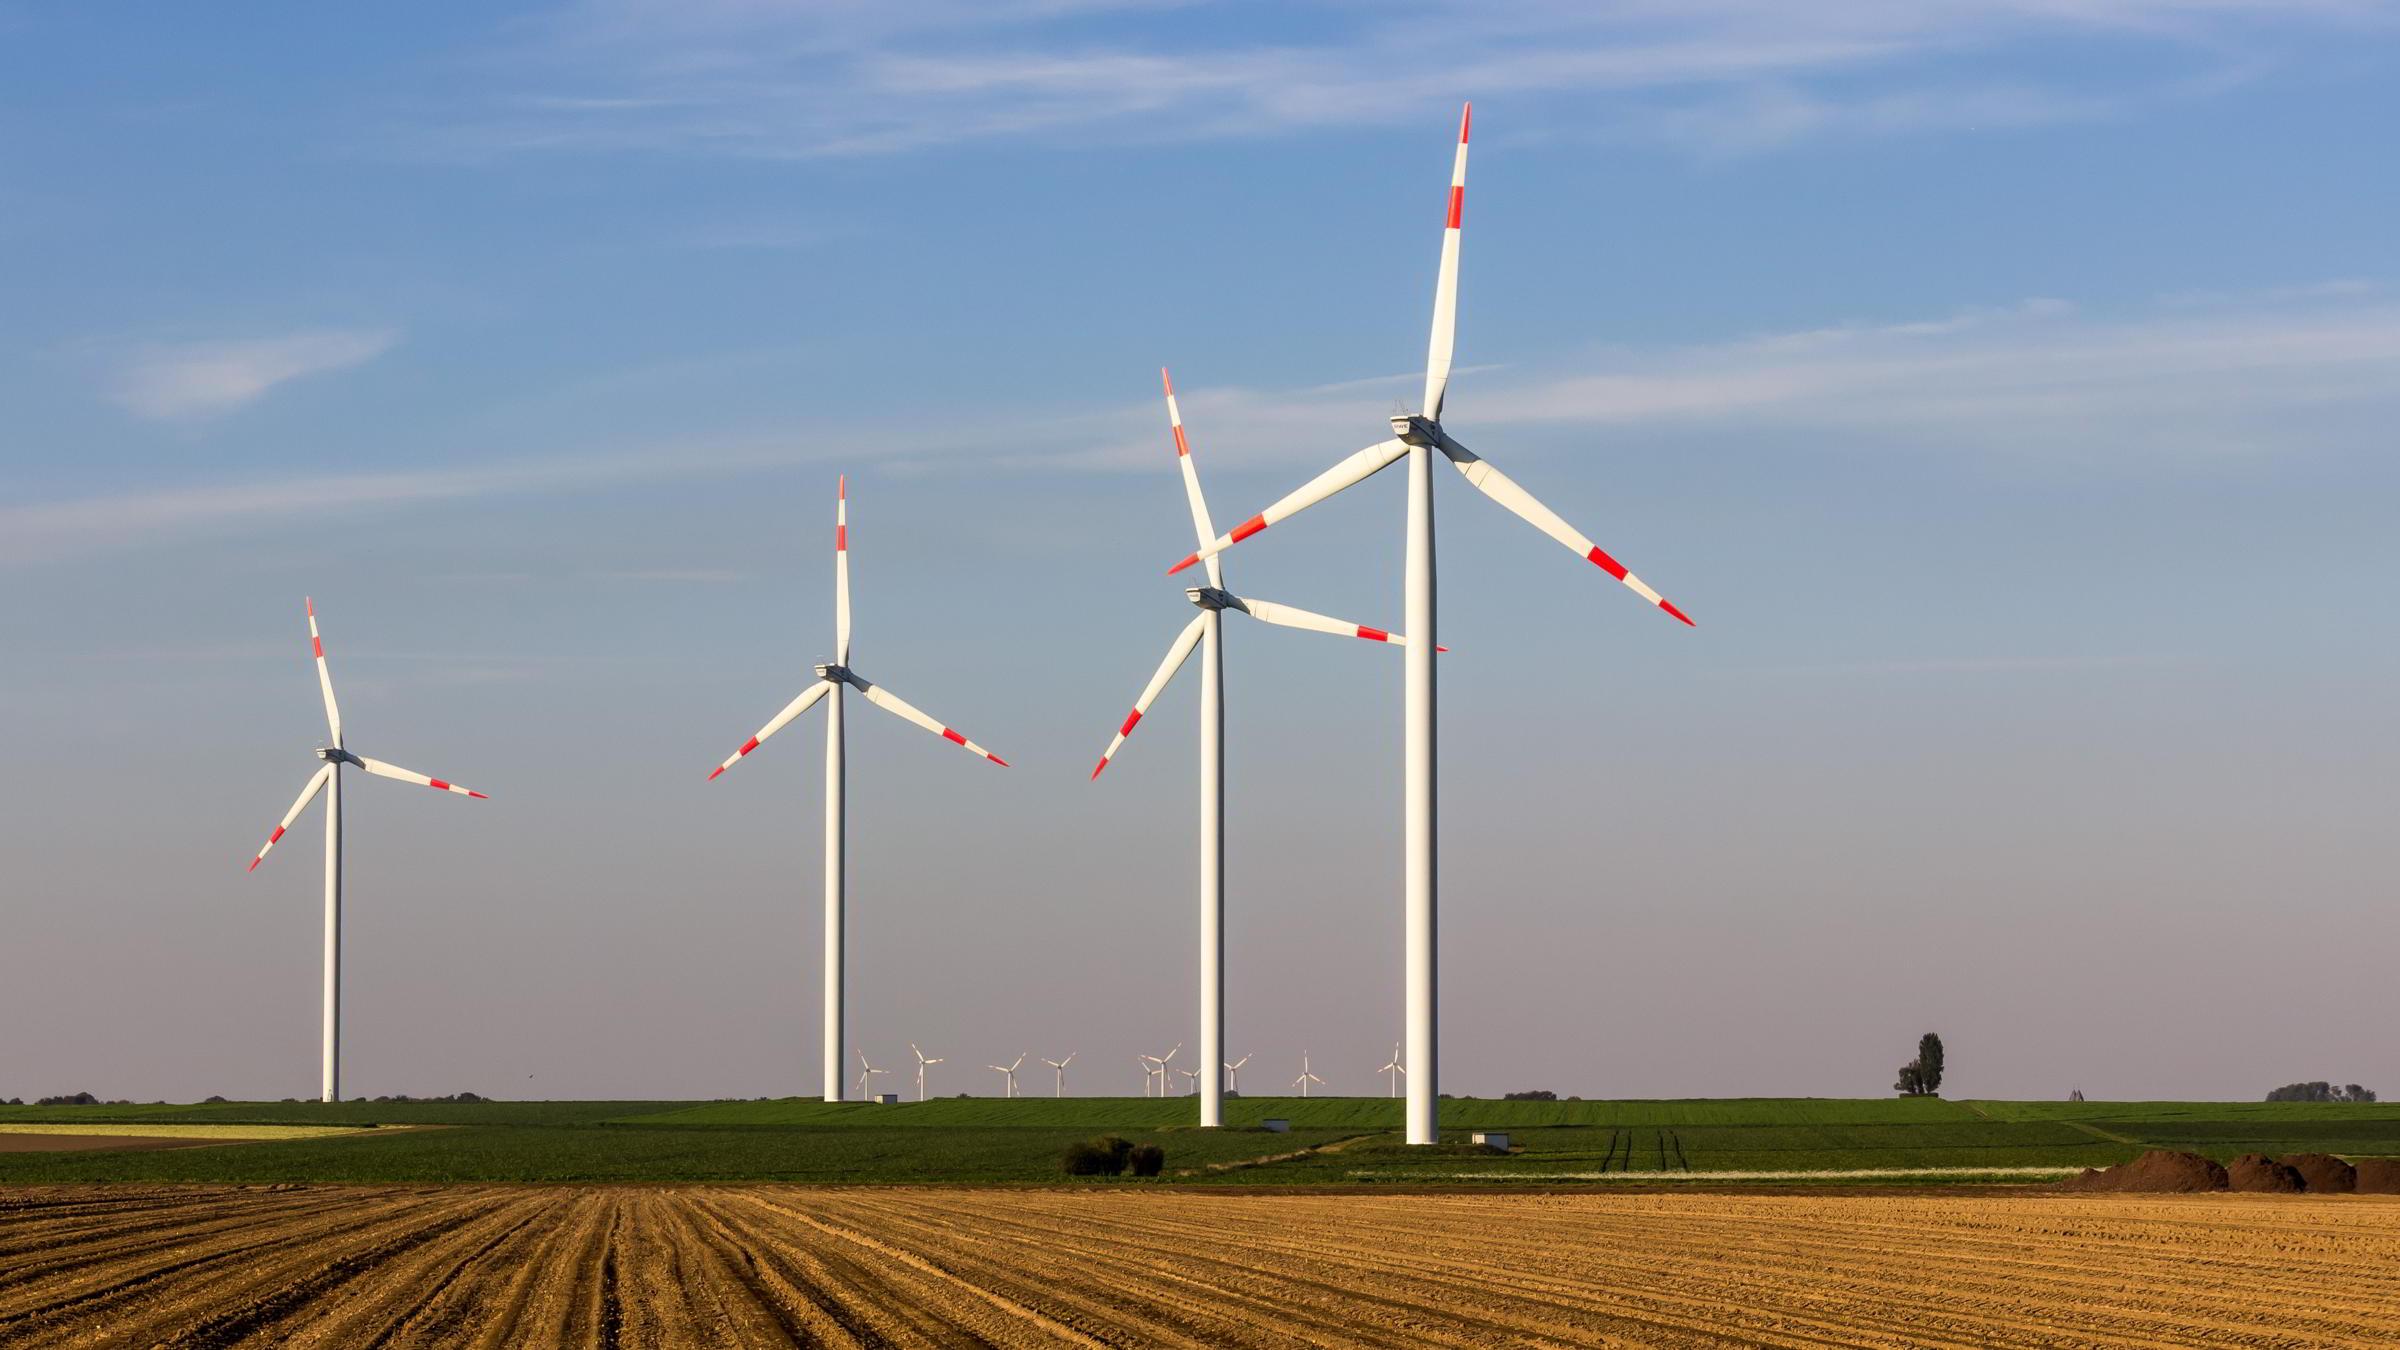 Energiebranche, PwC, High potential PwC, Felix Hasse, Carsten Tessmer, Berufseinstieg Energiebranche, Trends Energiewirtschaft, Energieexperten PwC